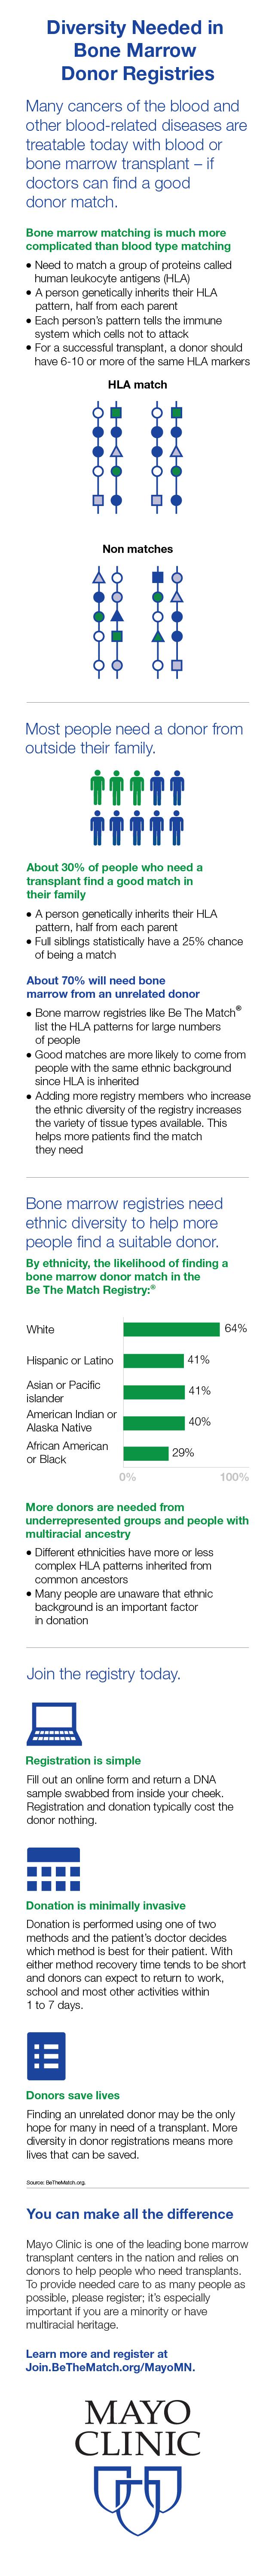 Infographic describing bone marrow donor diversity